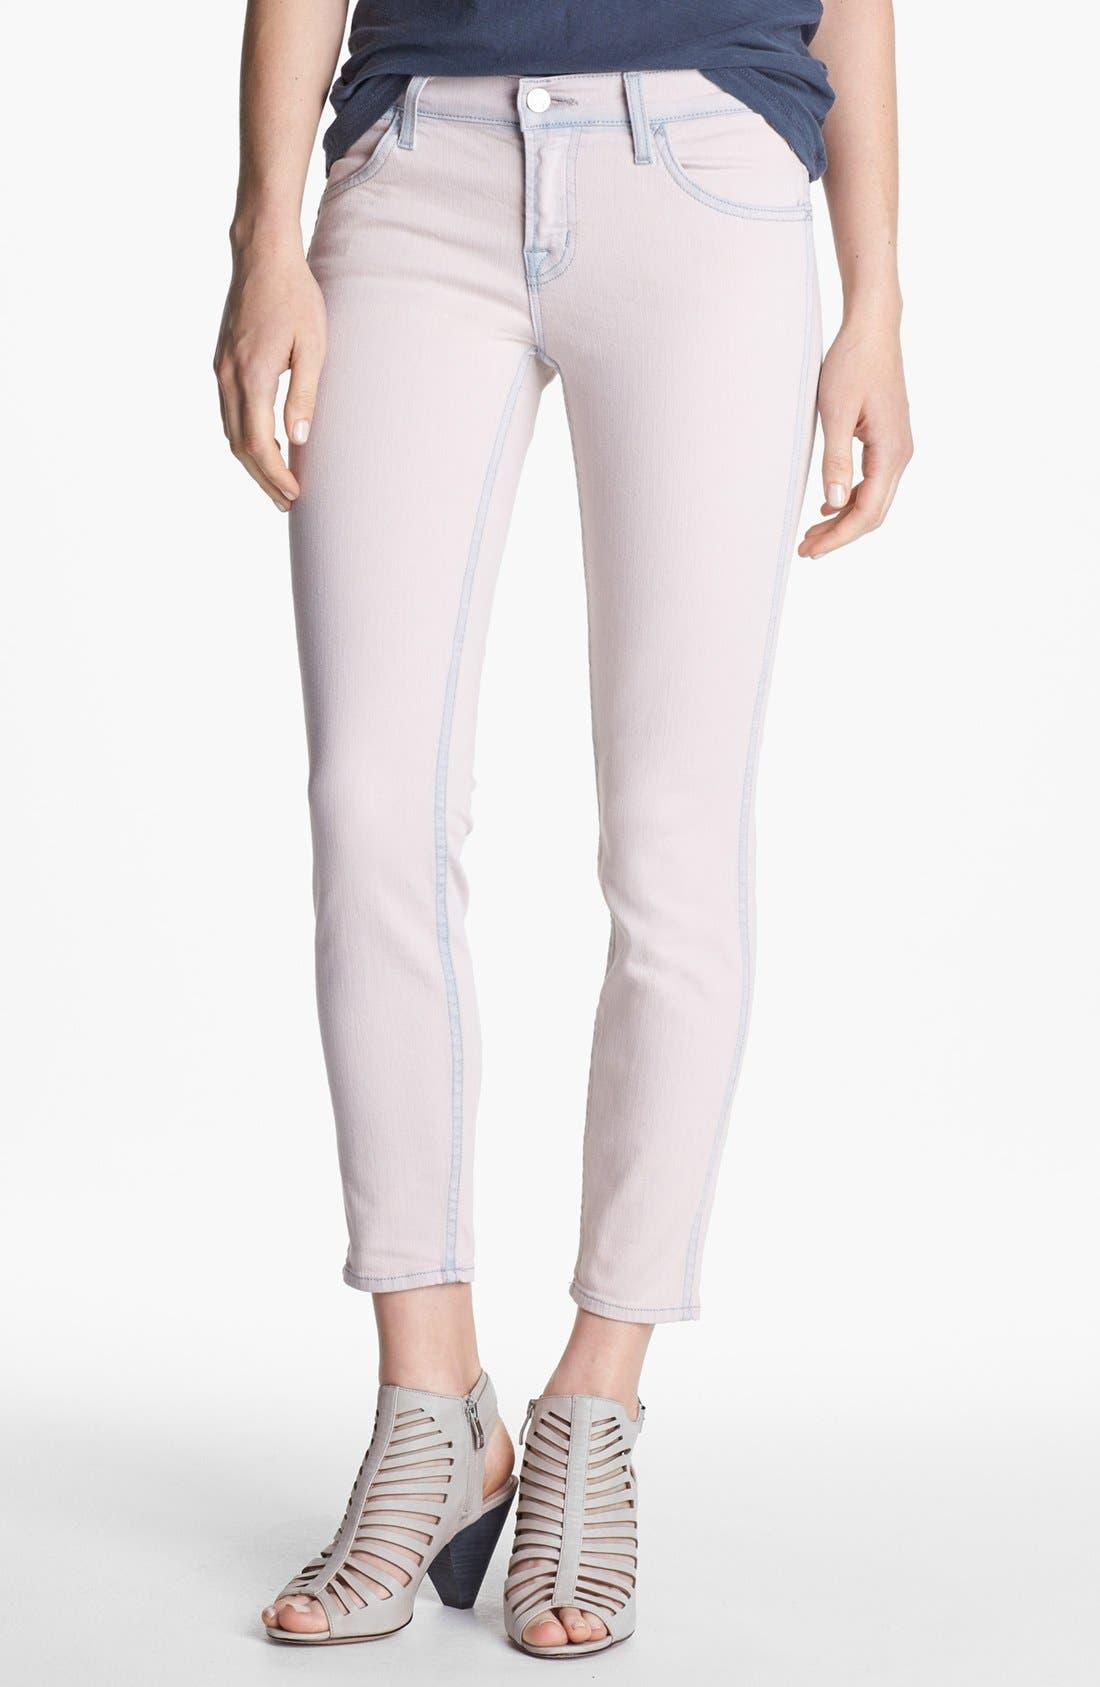 Main Image - J Brand 'Allegra' Ankle Skinny Jeans (Nirvana Magnolia)